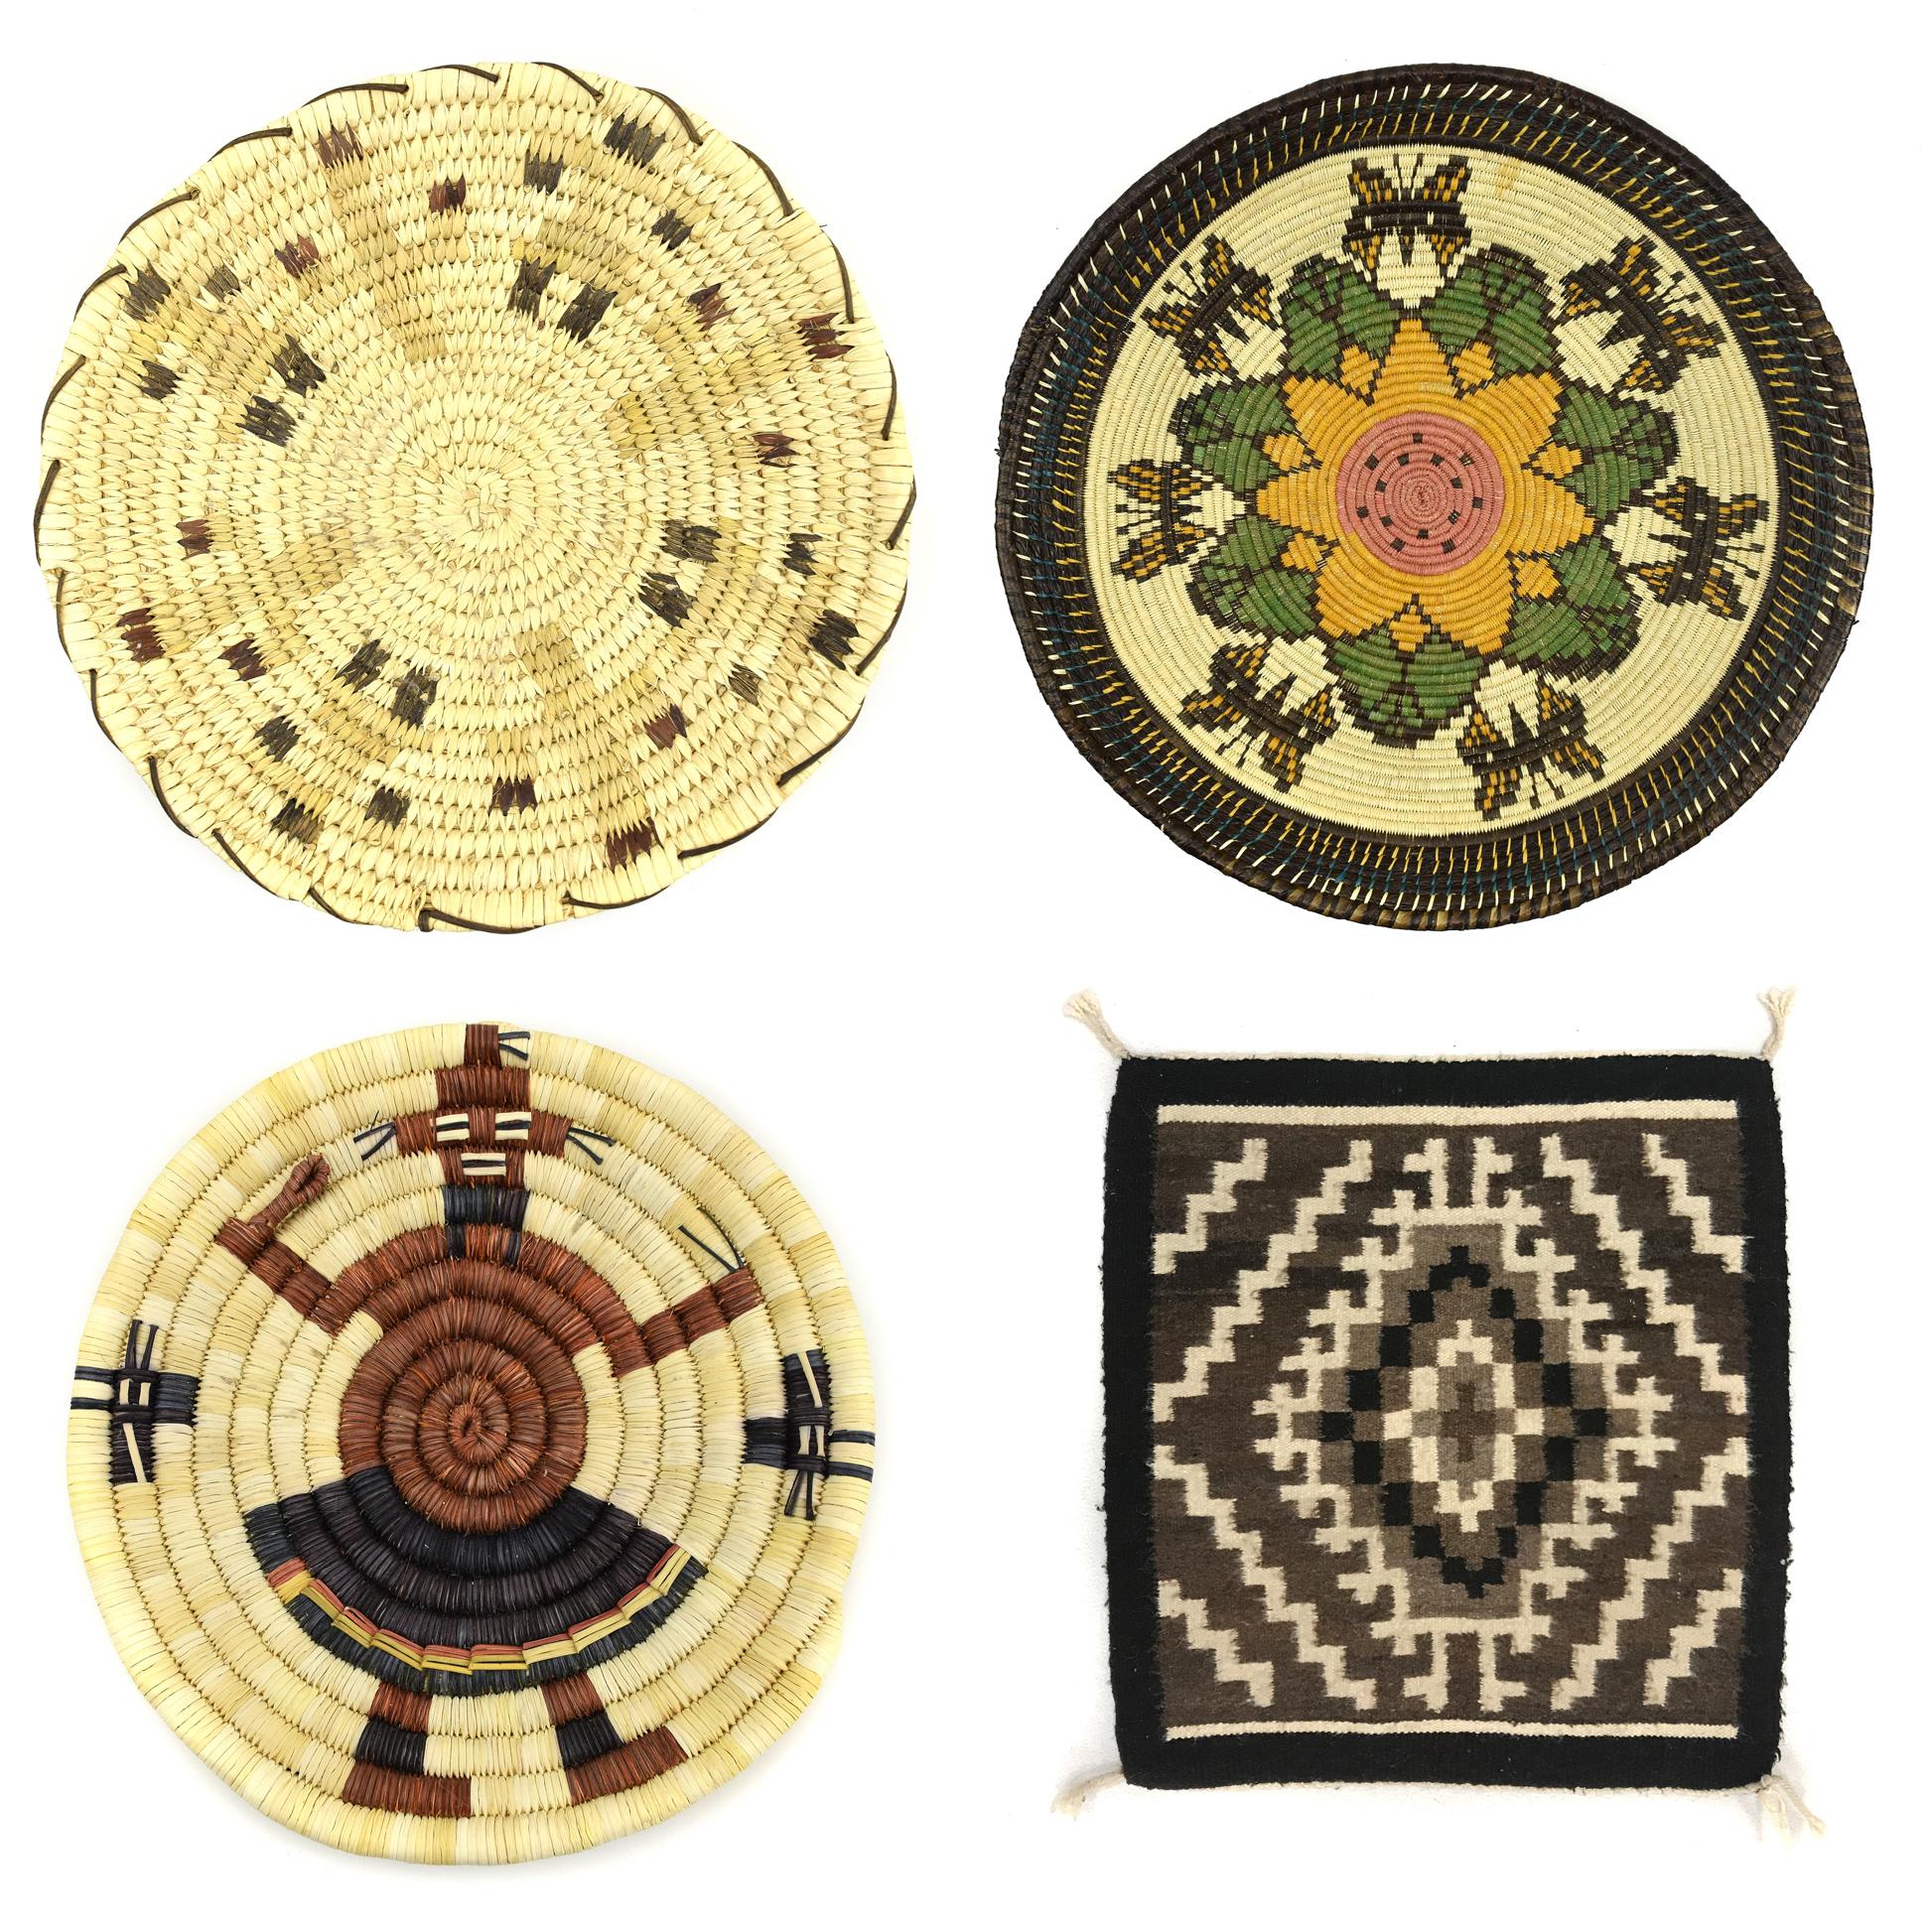 Featurette - Navajo Sampler Weavings, Panama, Tohono O'odham, and Hopi Baskets